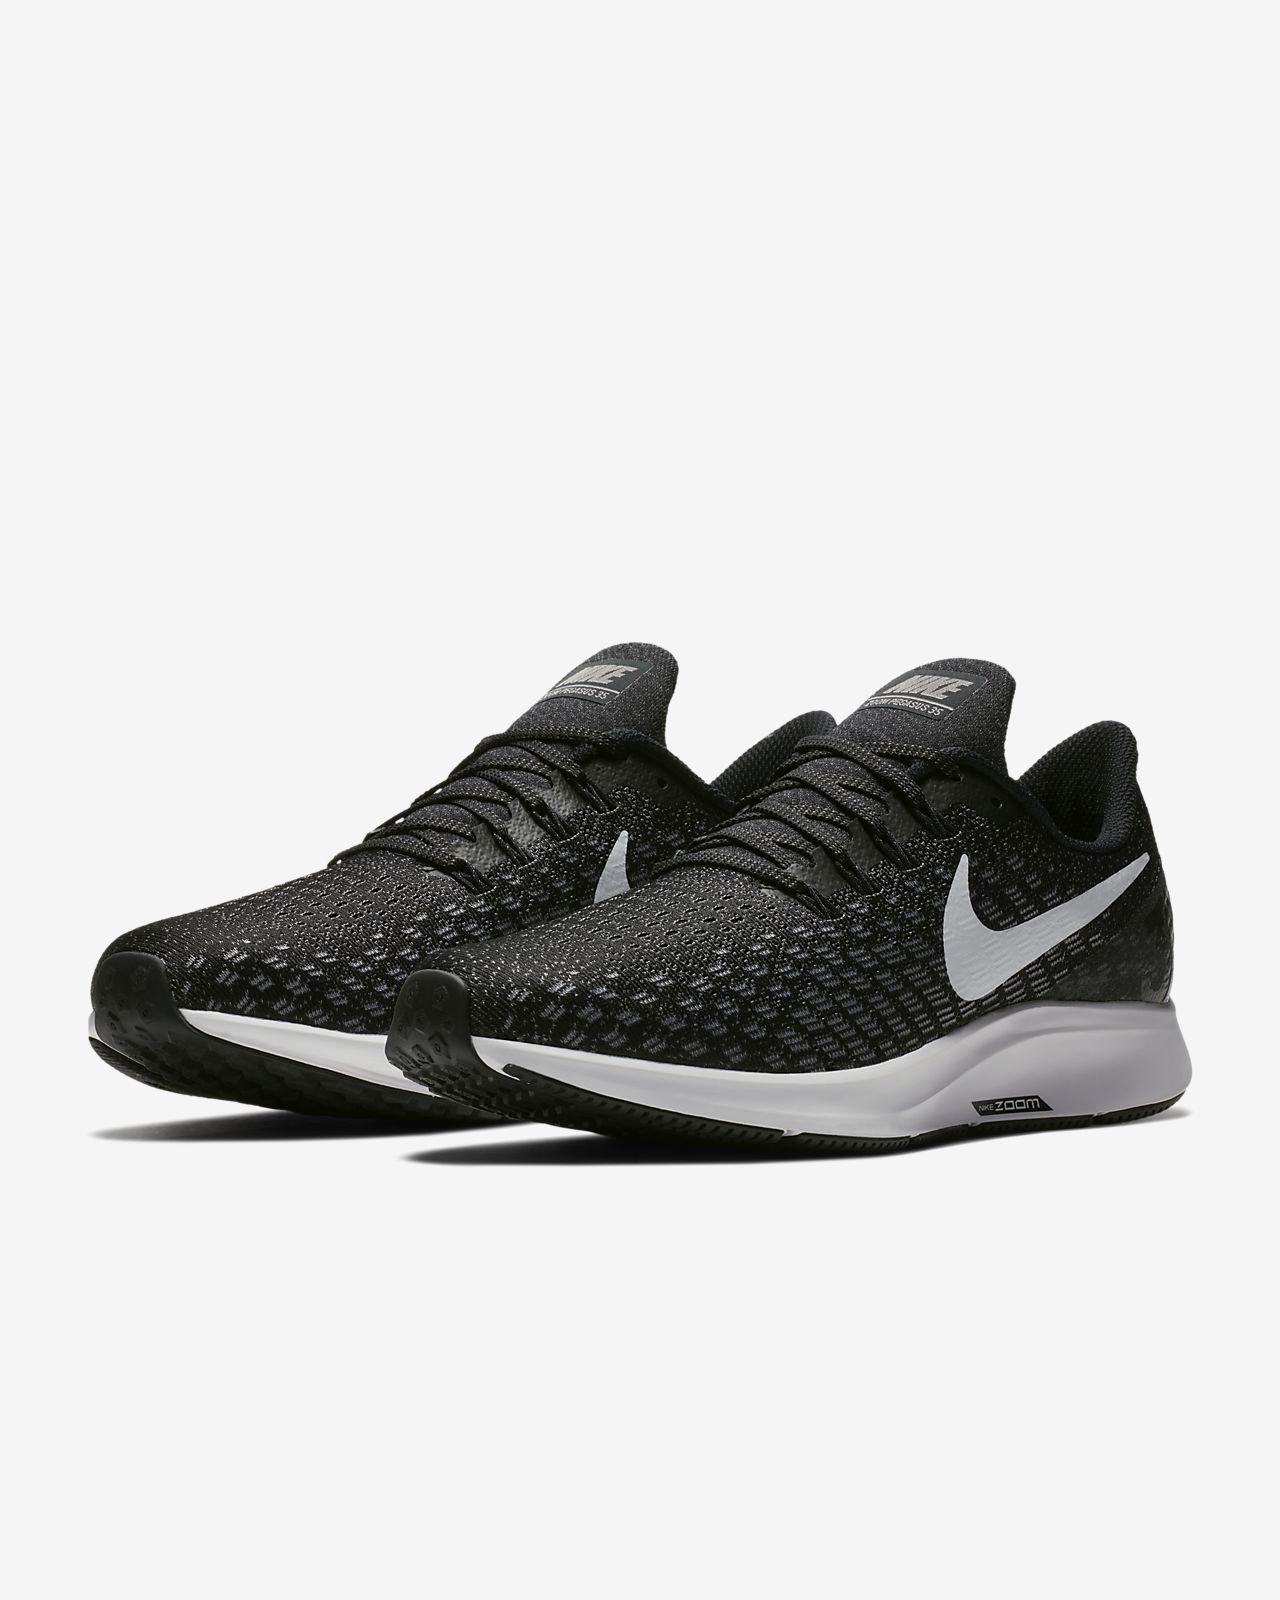 e3104e7c139 Chaussure de running Nike Air Zoom Pegasus 35 pour Homme. Nike.com FR